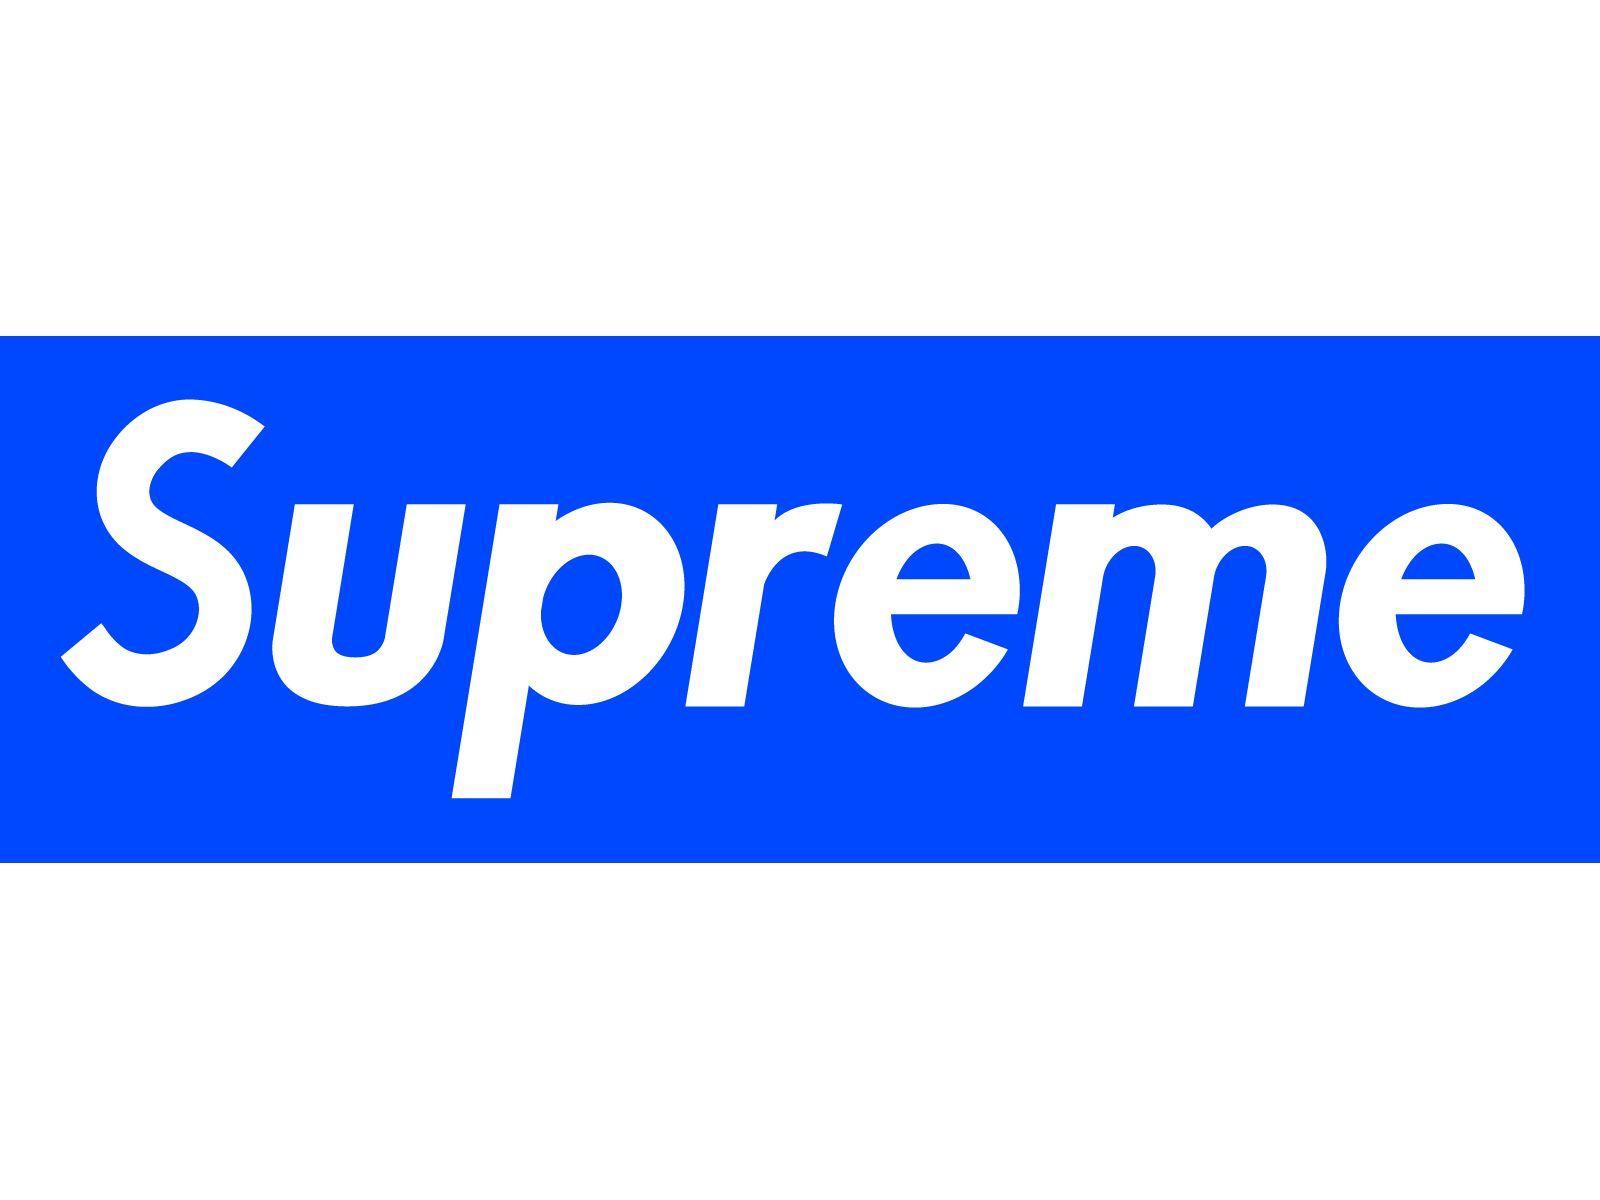 Blue Supreme Box Logo Wallpapers On Wallpaperdog